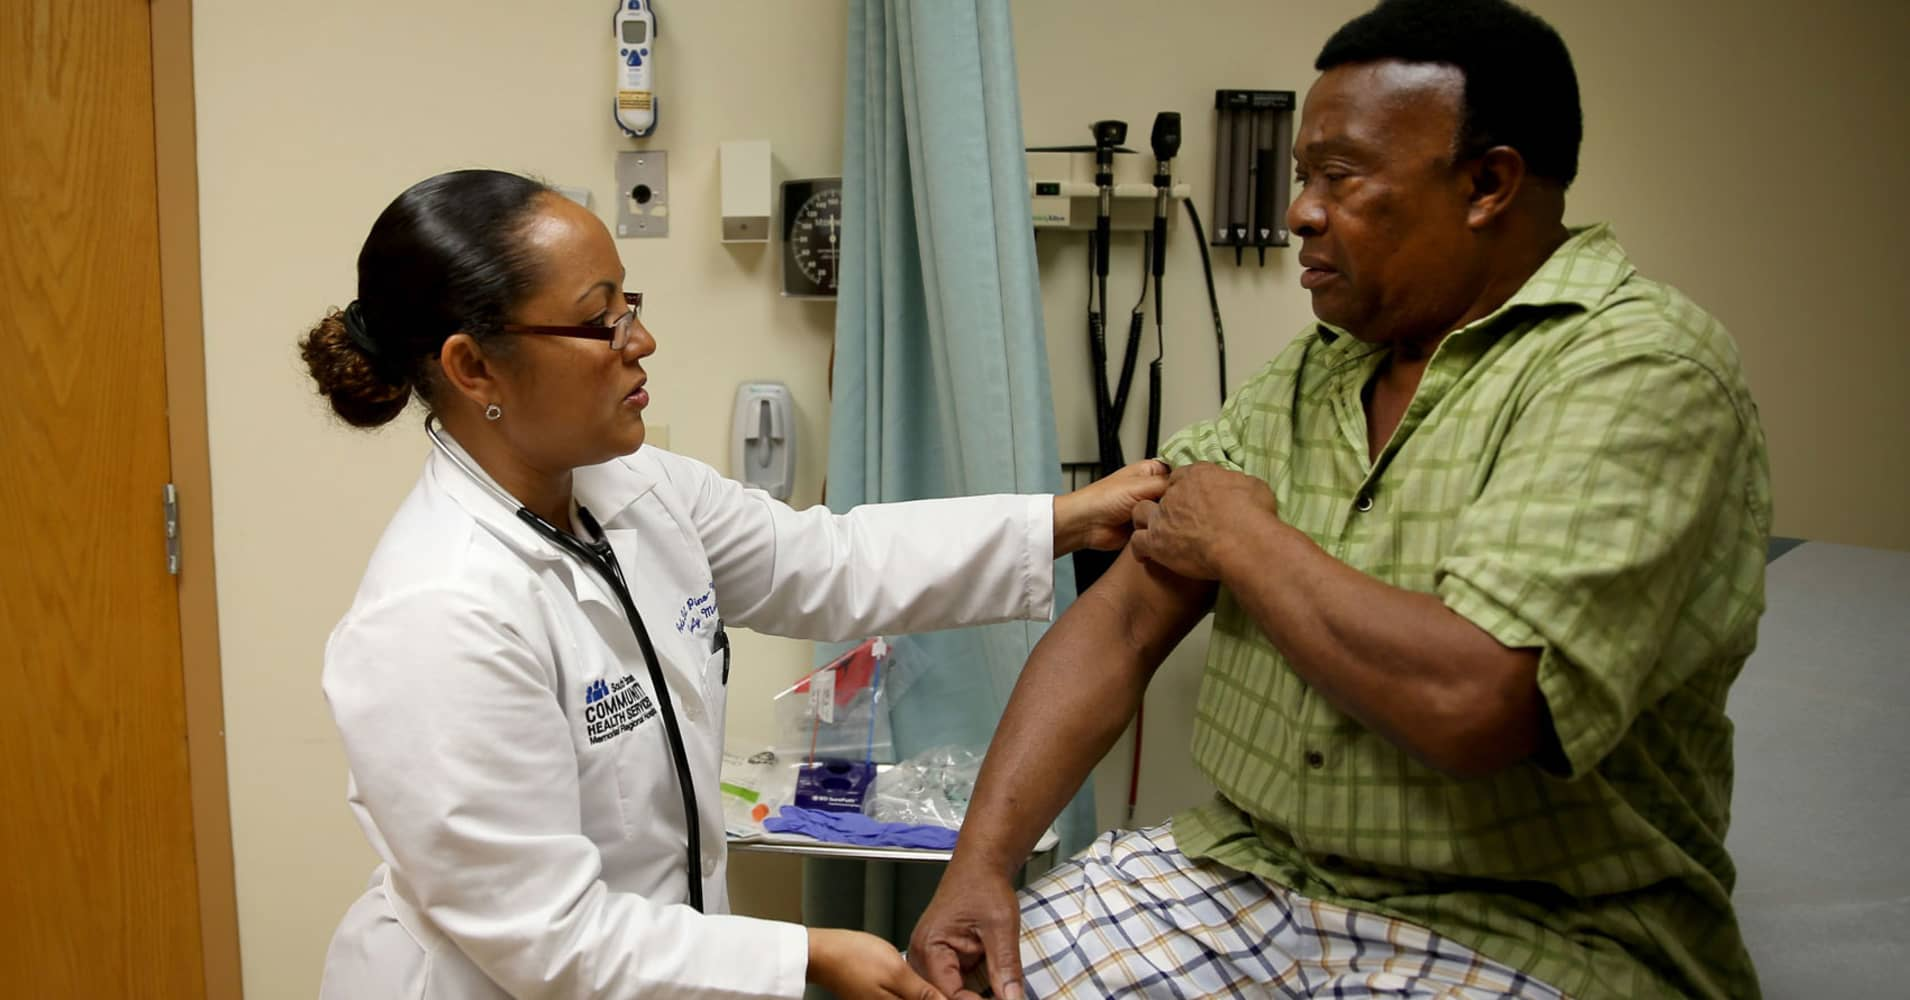 Senate Obamacare replacement would lead to 22 million more uninsured in 2026, CBO estimates